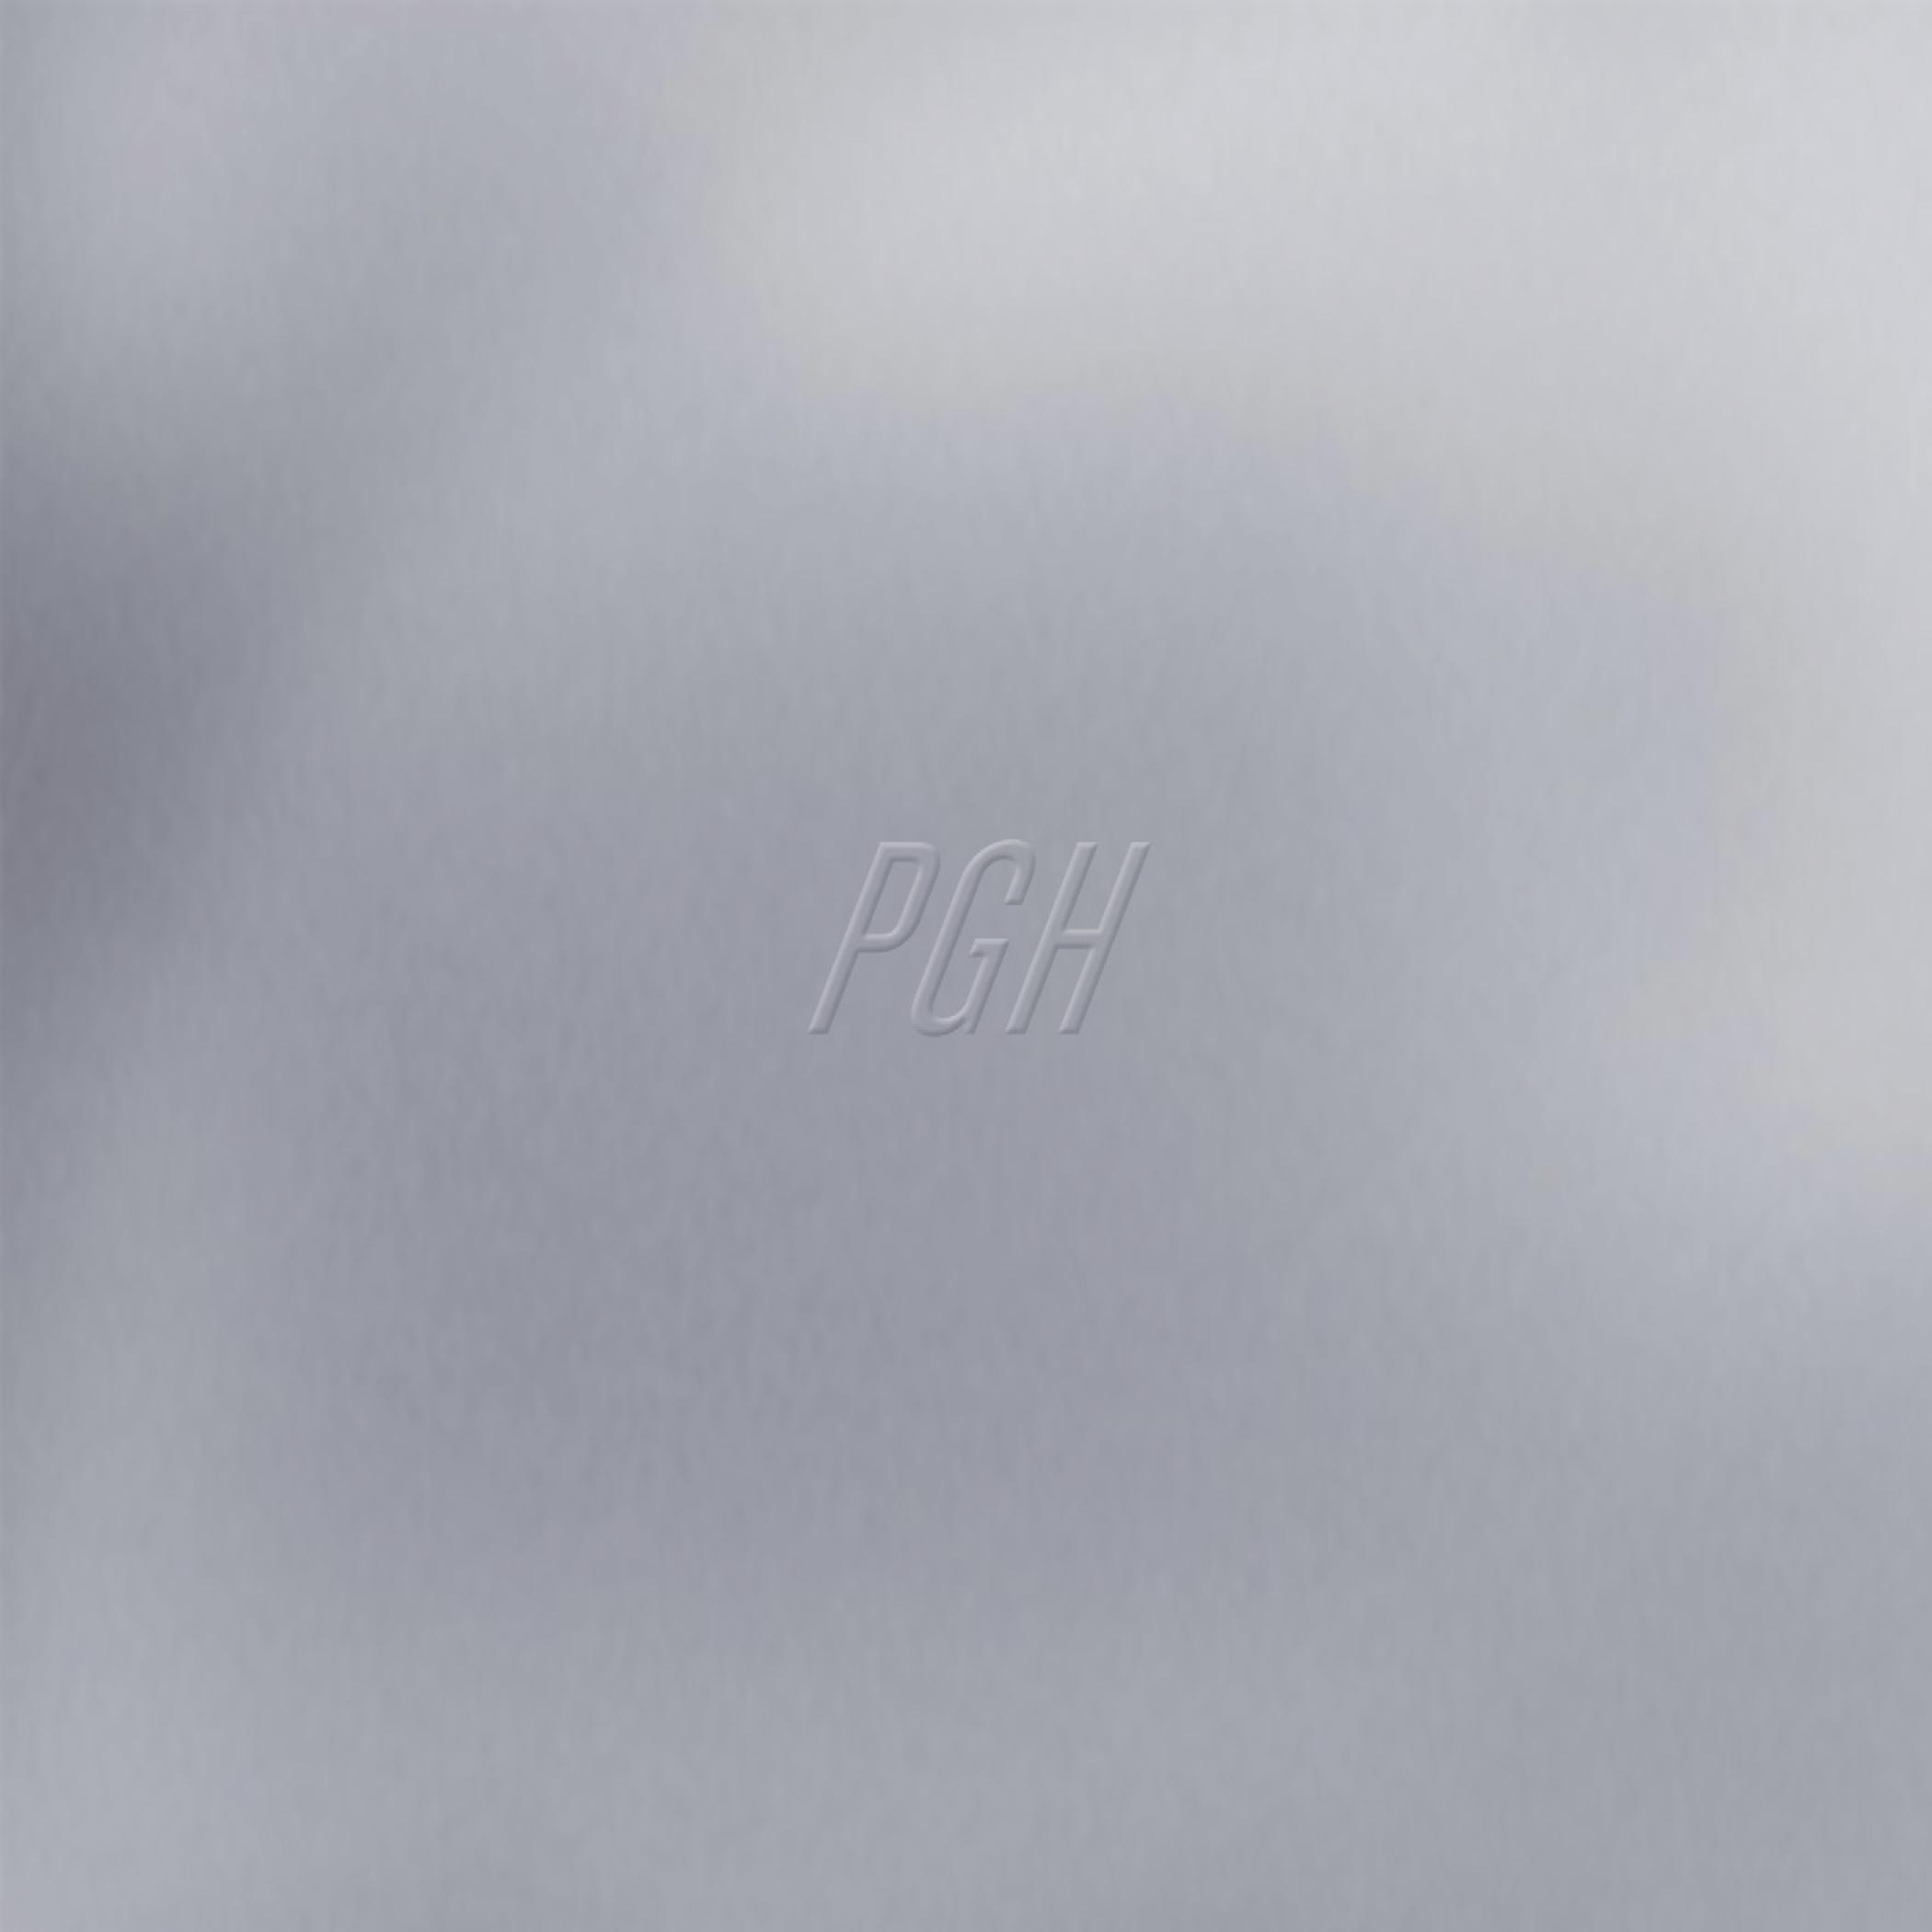 PGH 1.jpeg